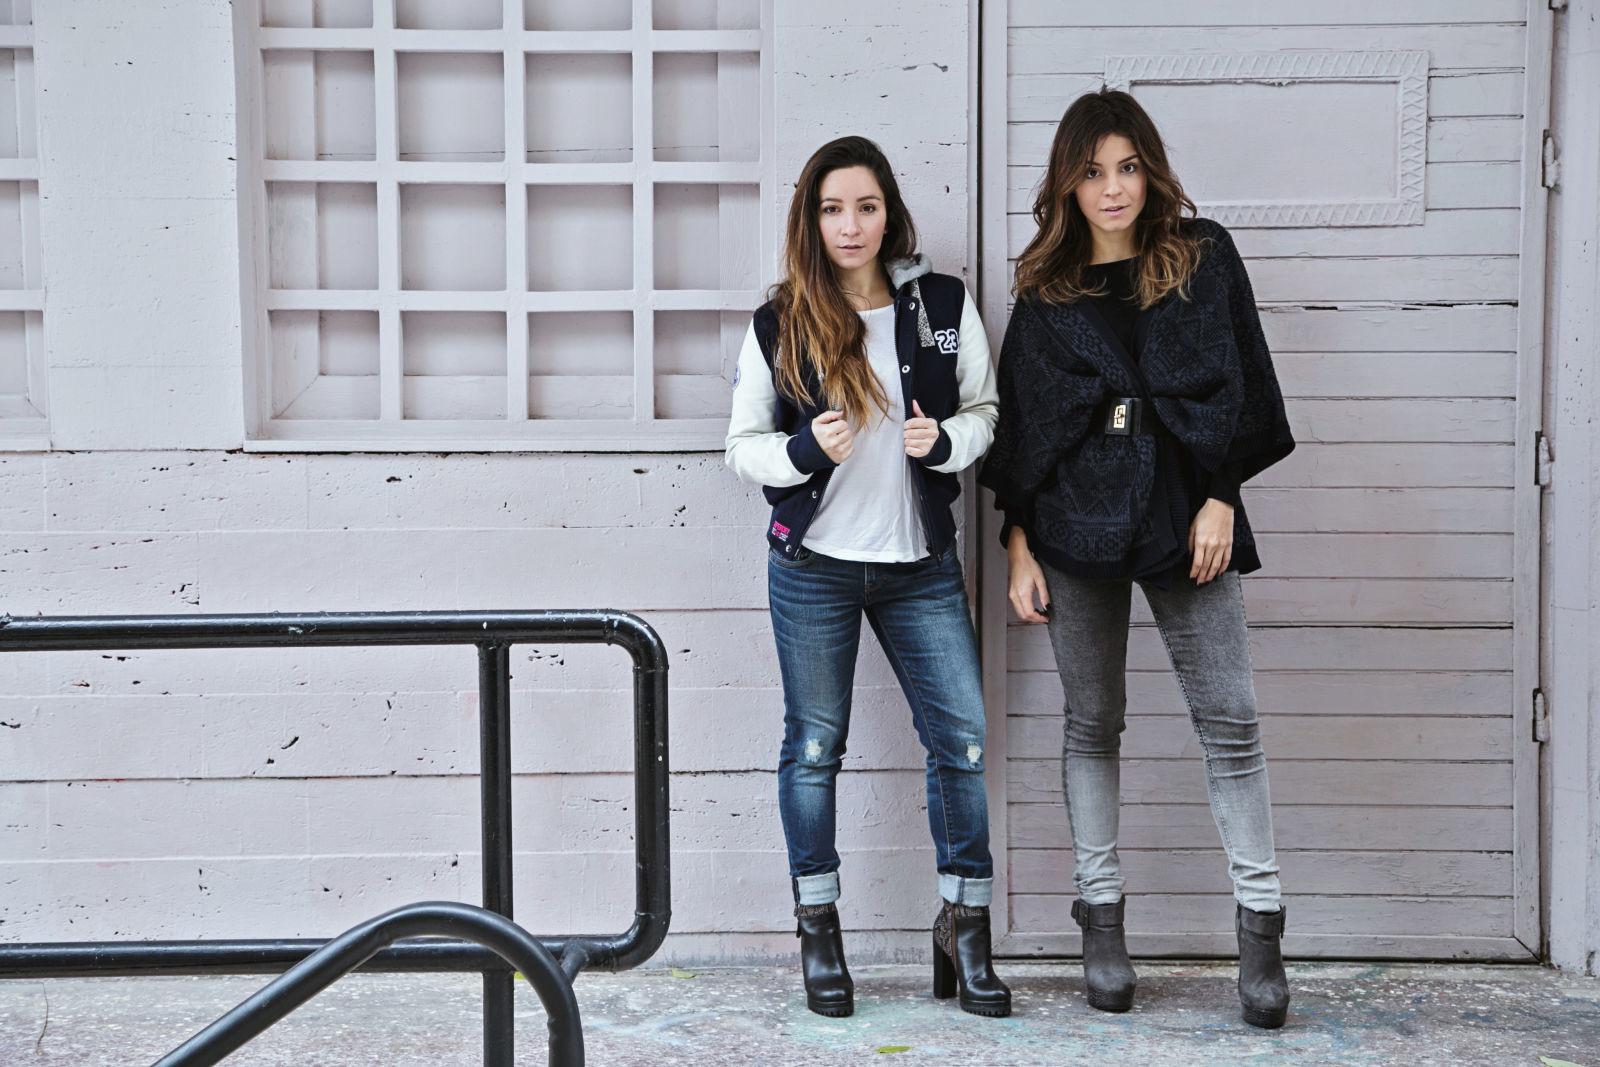 5480da55f29 Stylish winter looks - Fashion Has It..